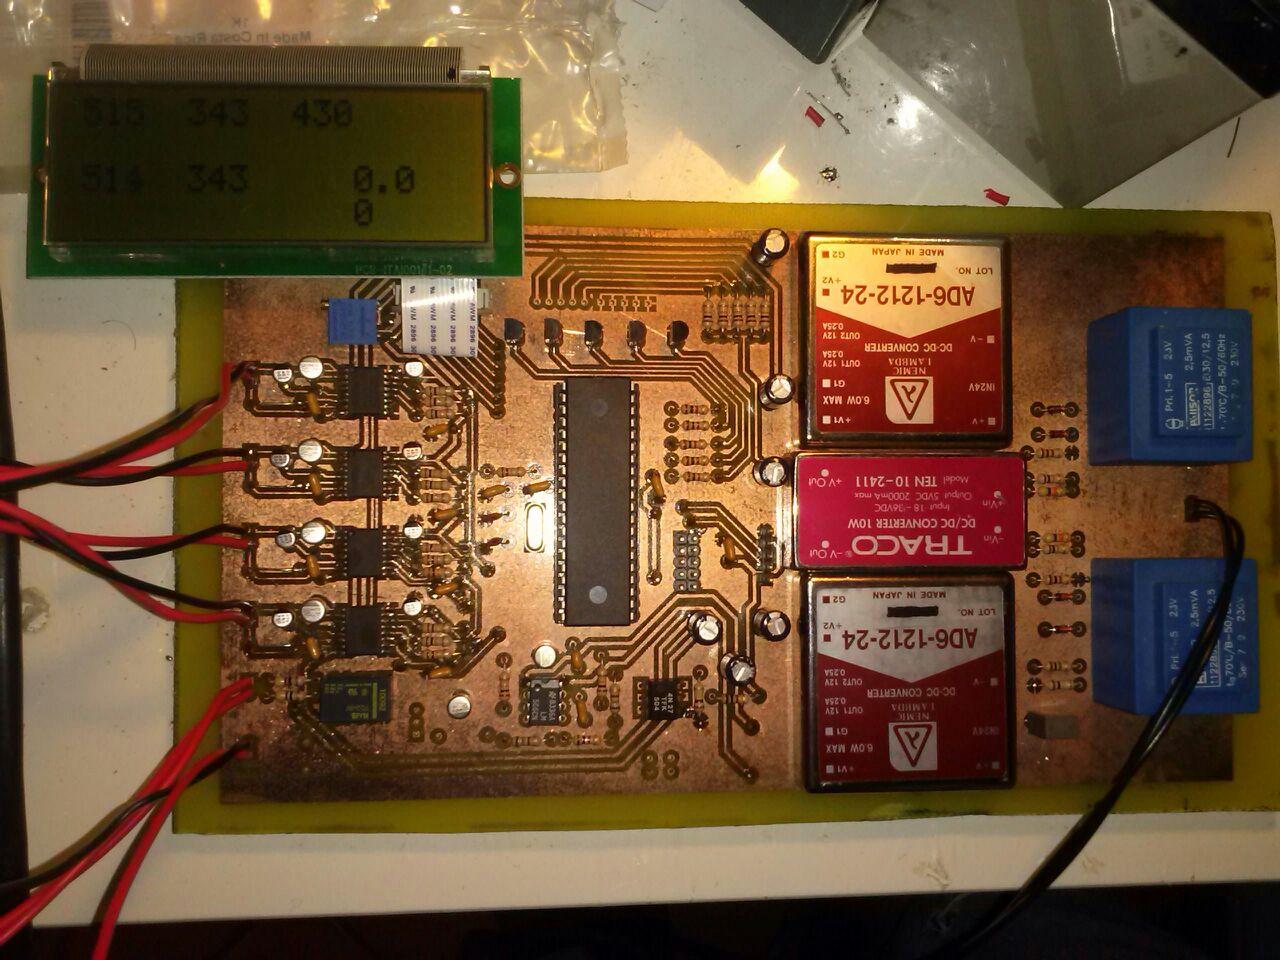 Lm2596s DC-DC Regolatore di tensione-step-down quadro regolatore Power Supply Modulo Valle